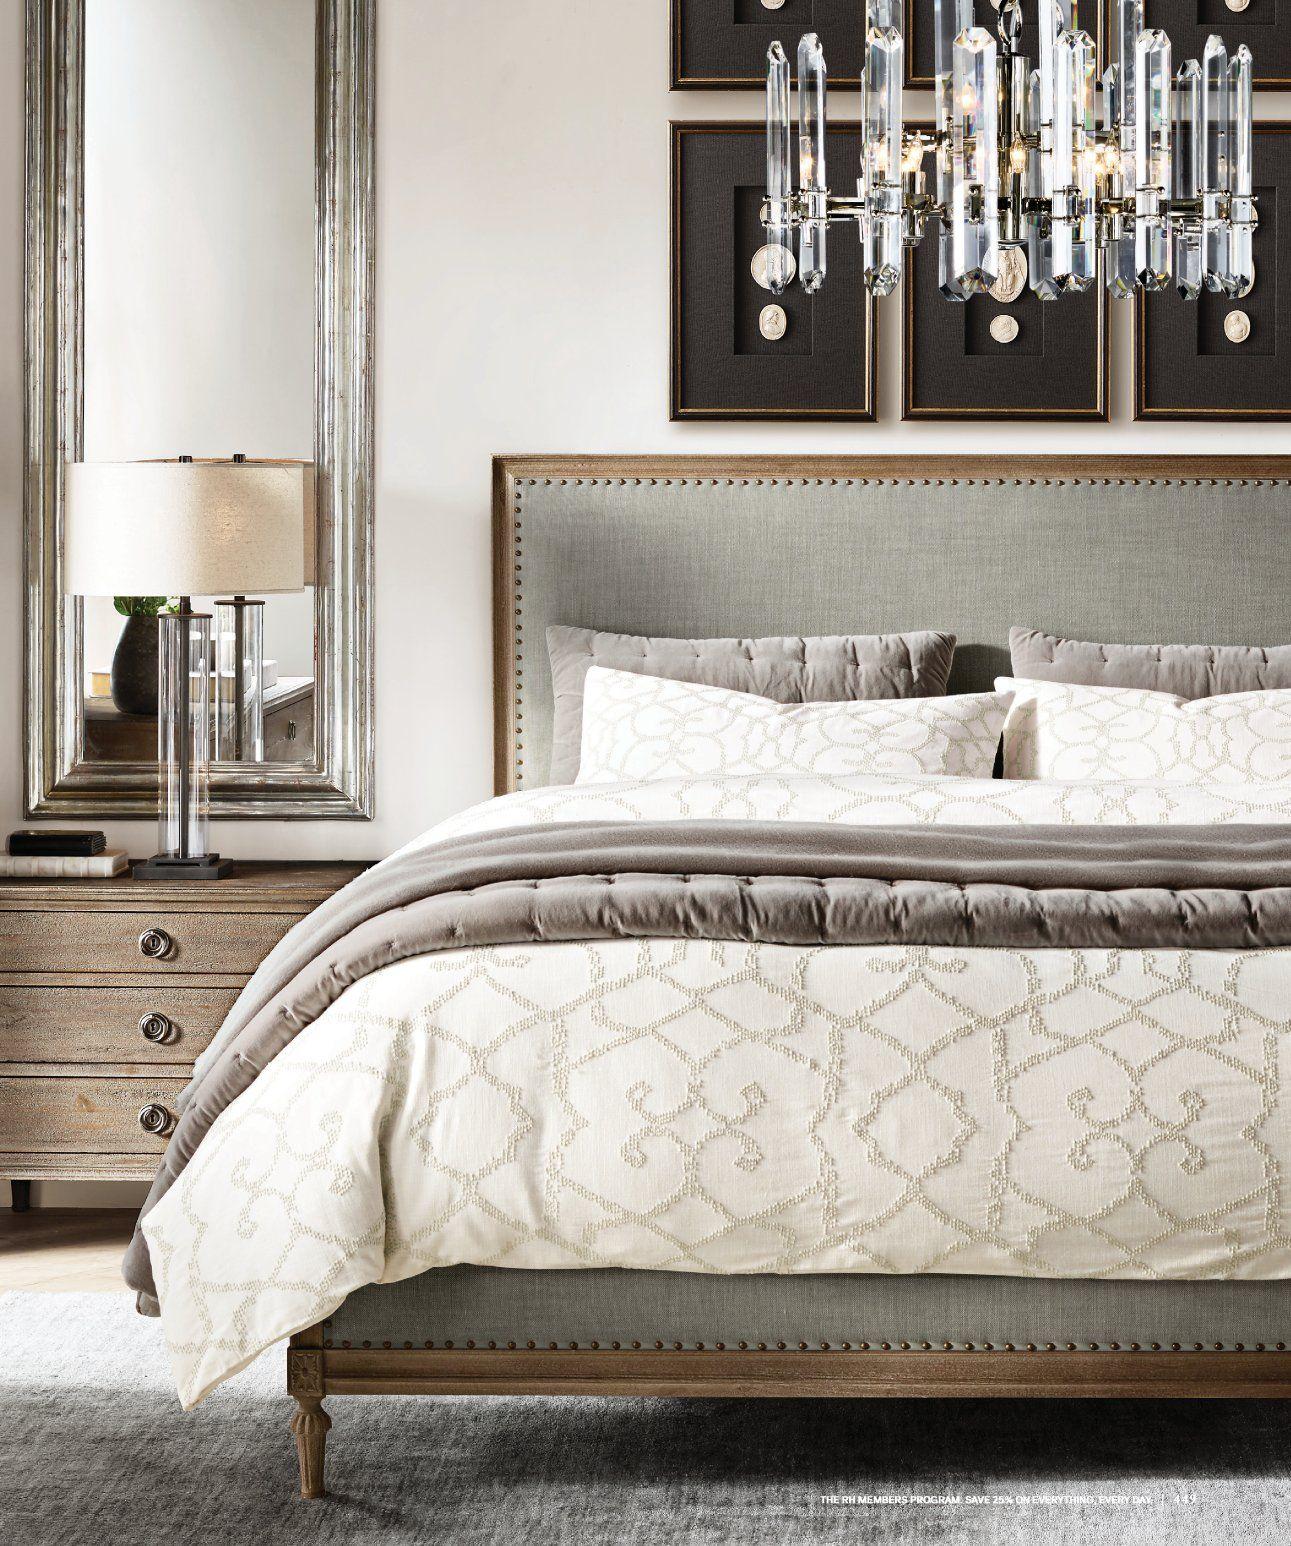 Rh Source Books Luxury Bedroom Furniture Home Decor Bedroom Master Bedroom Furniture